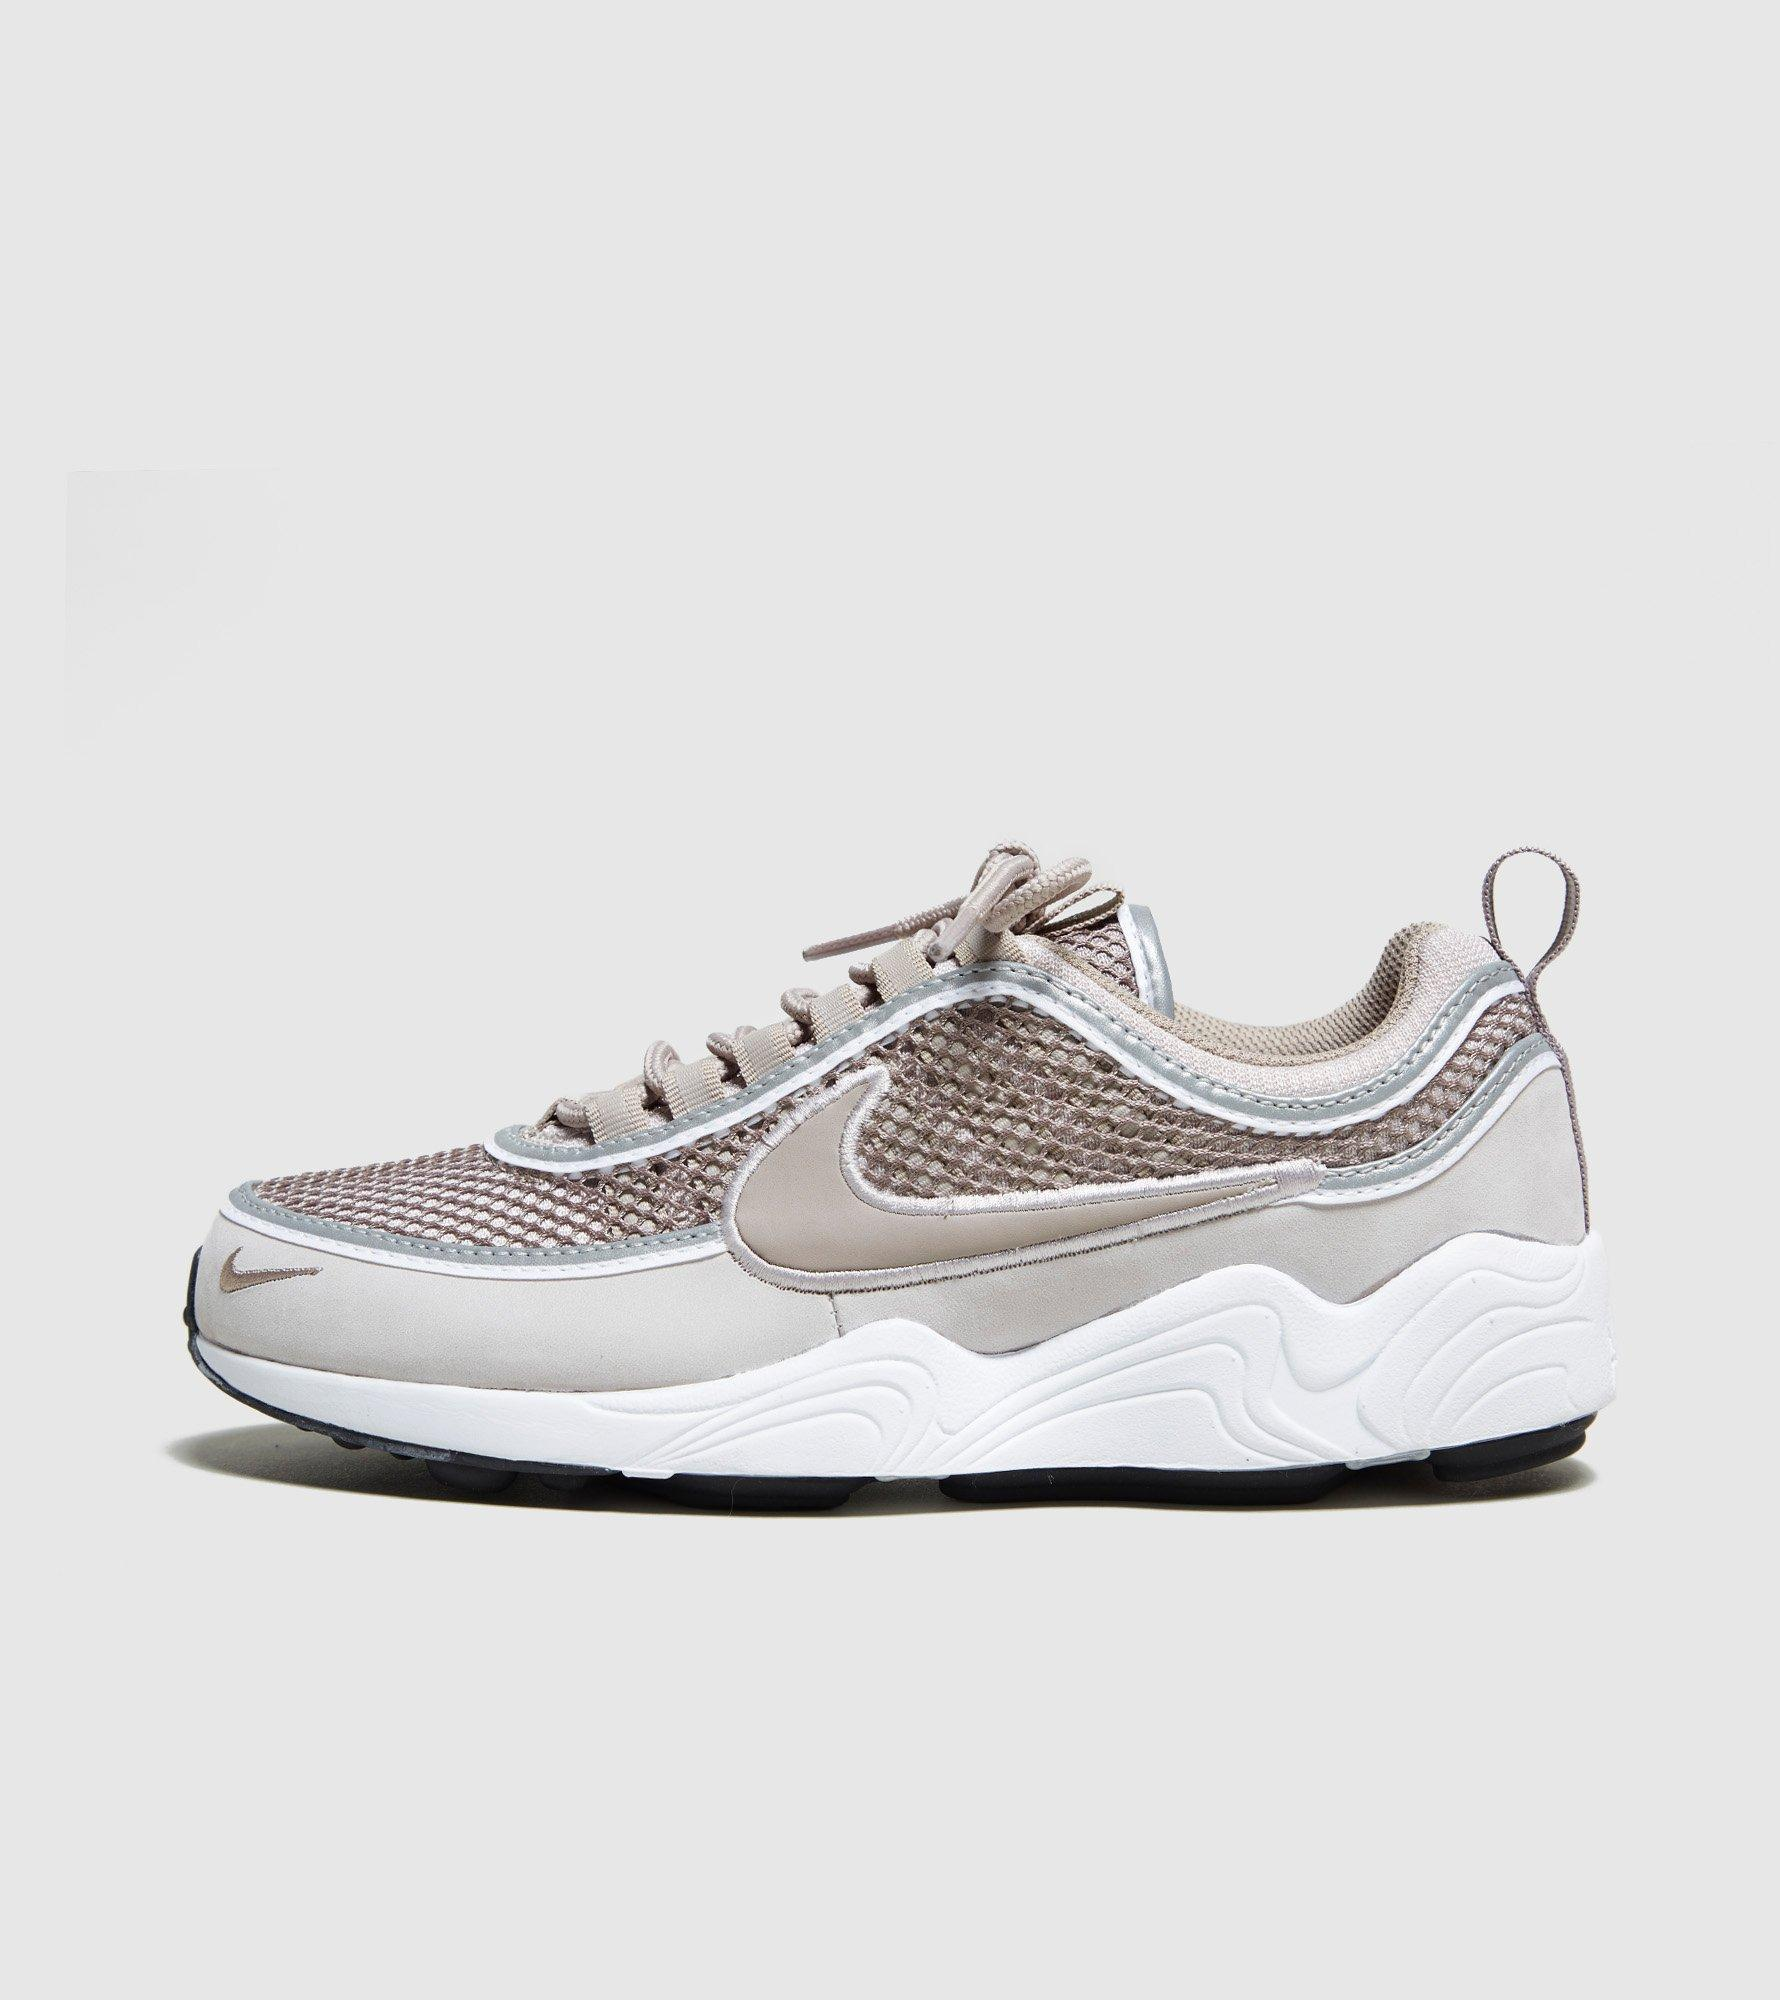 40fbe856793ce Lyst - Nike Air Zoom Spiridon Women s